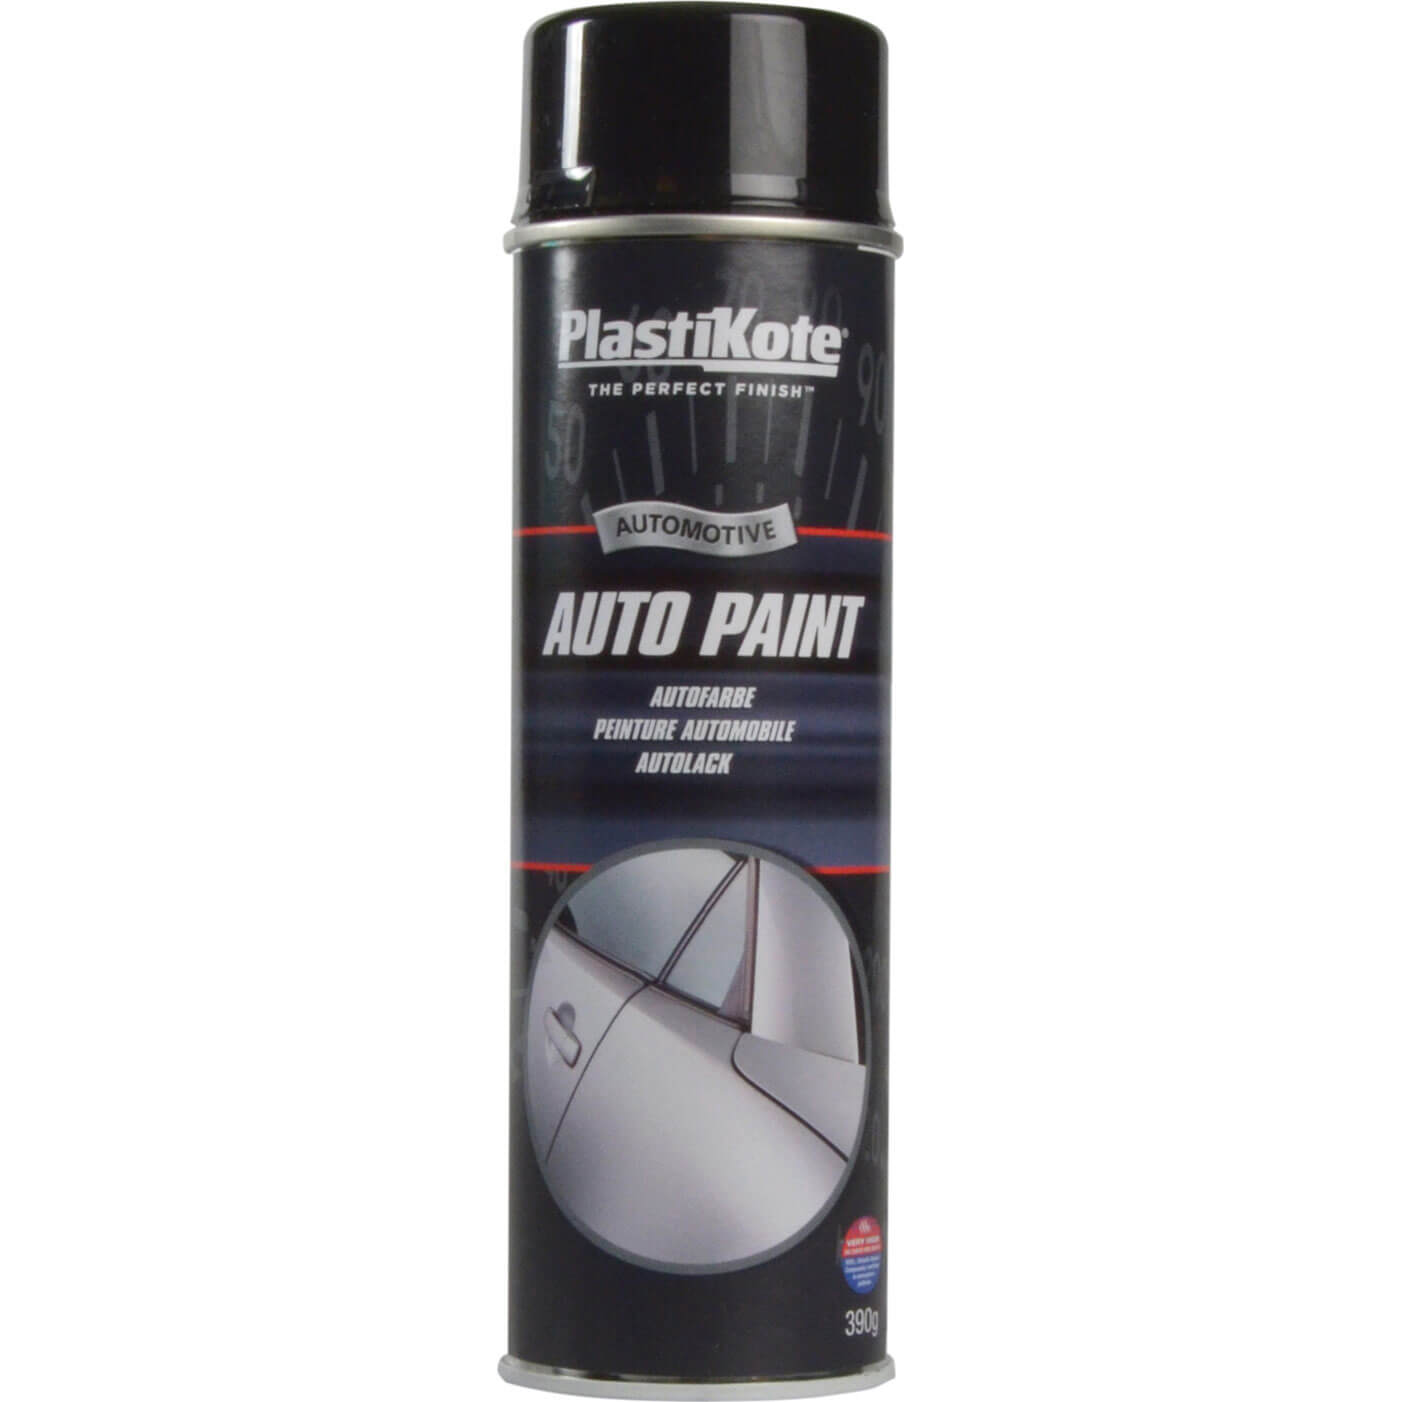 Image of Plasti-Kote Auto Paint Gloss Black 500ml